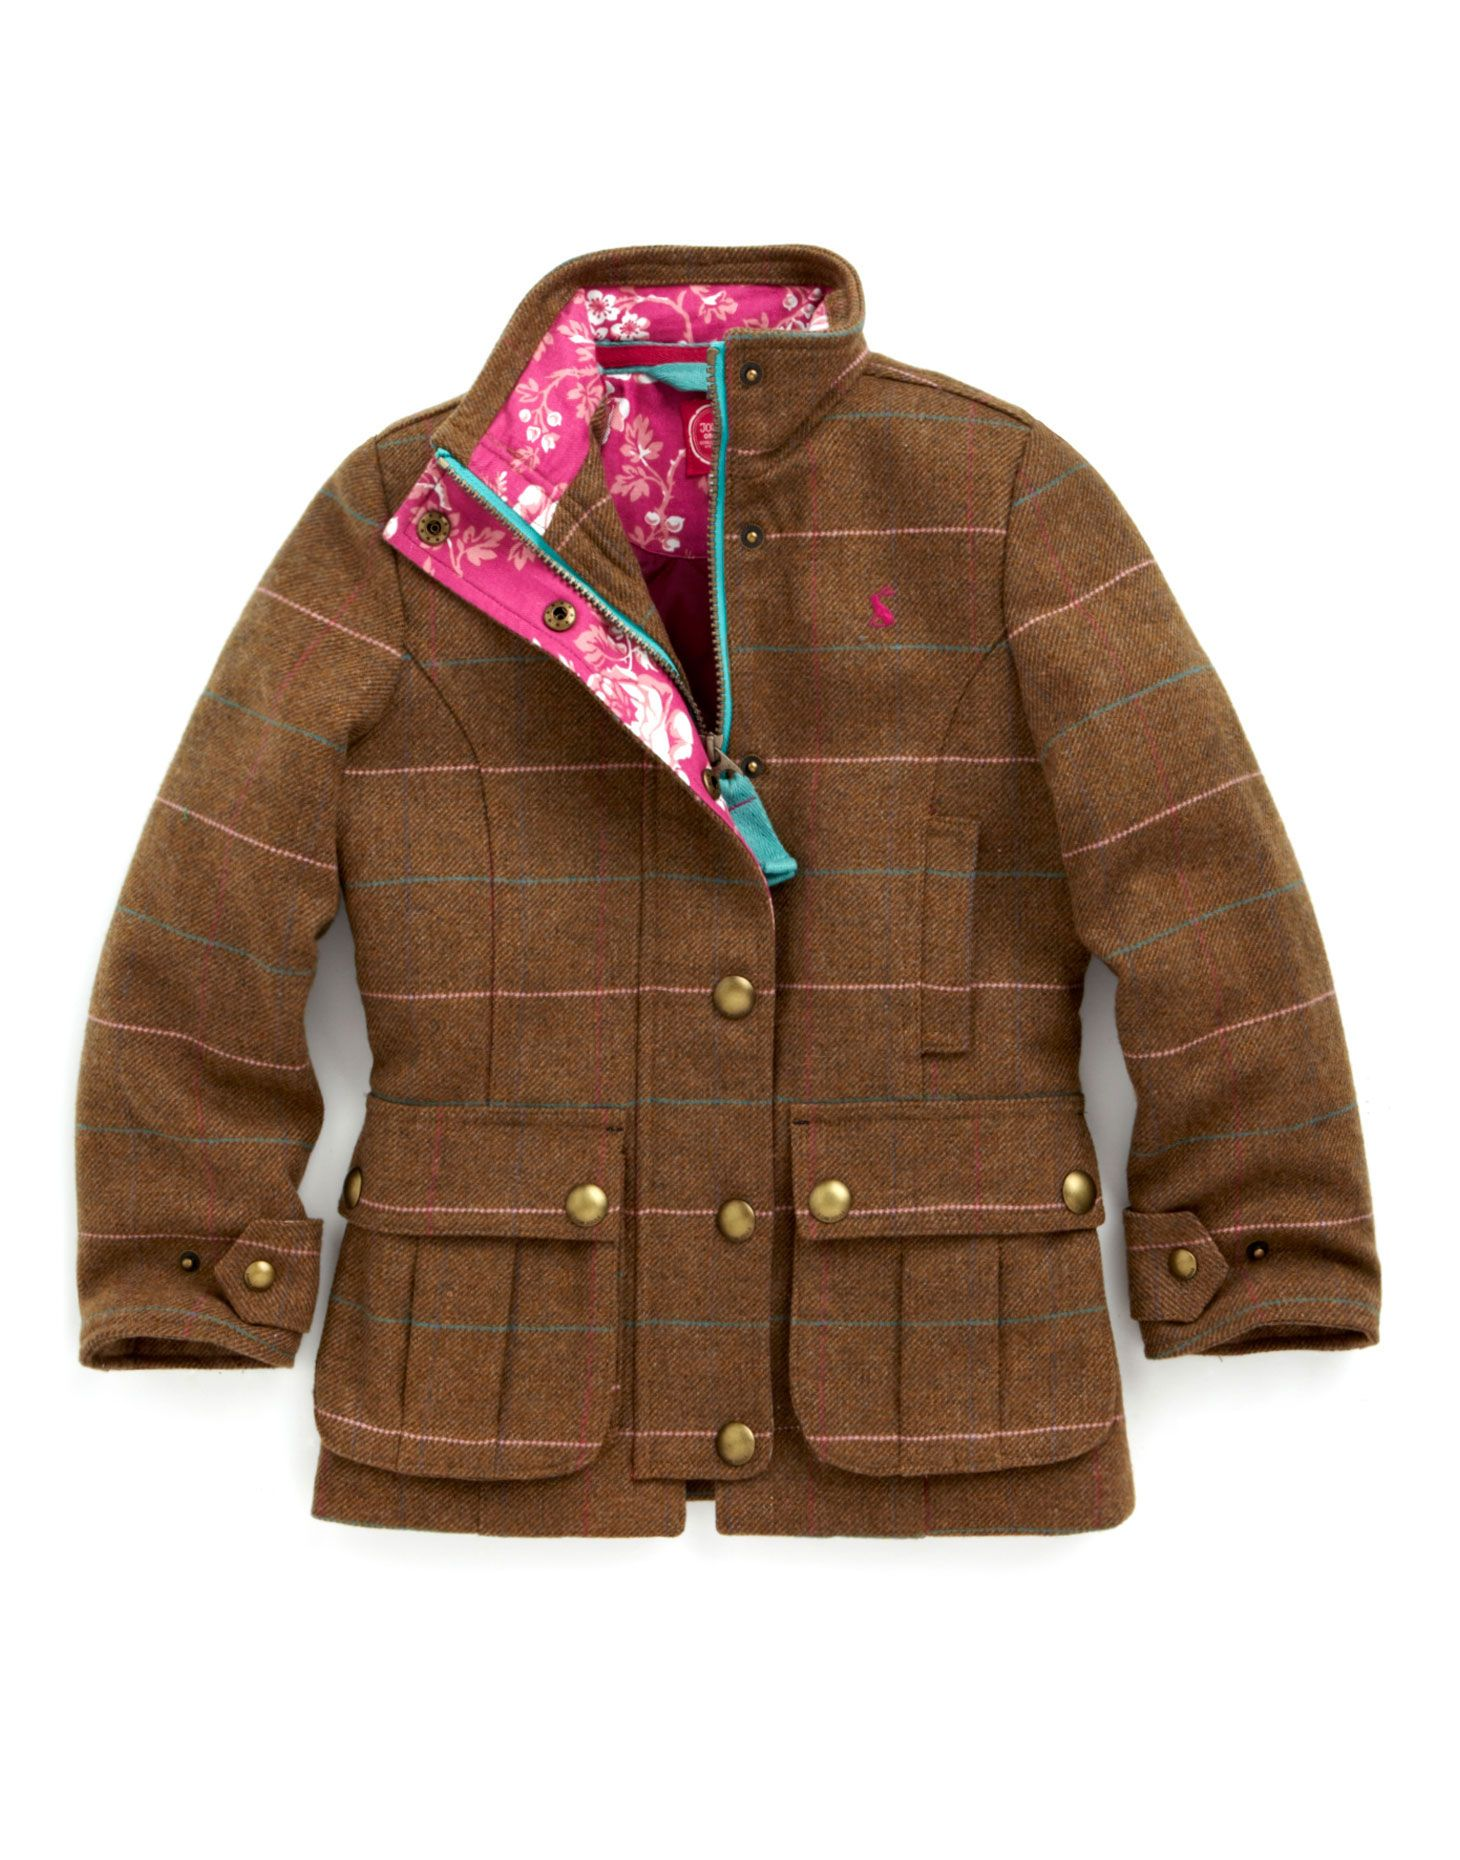 JNR ASTBURY Girls Tweed Coats, Brown // Joules | Little Style ...